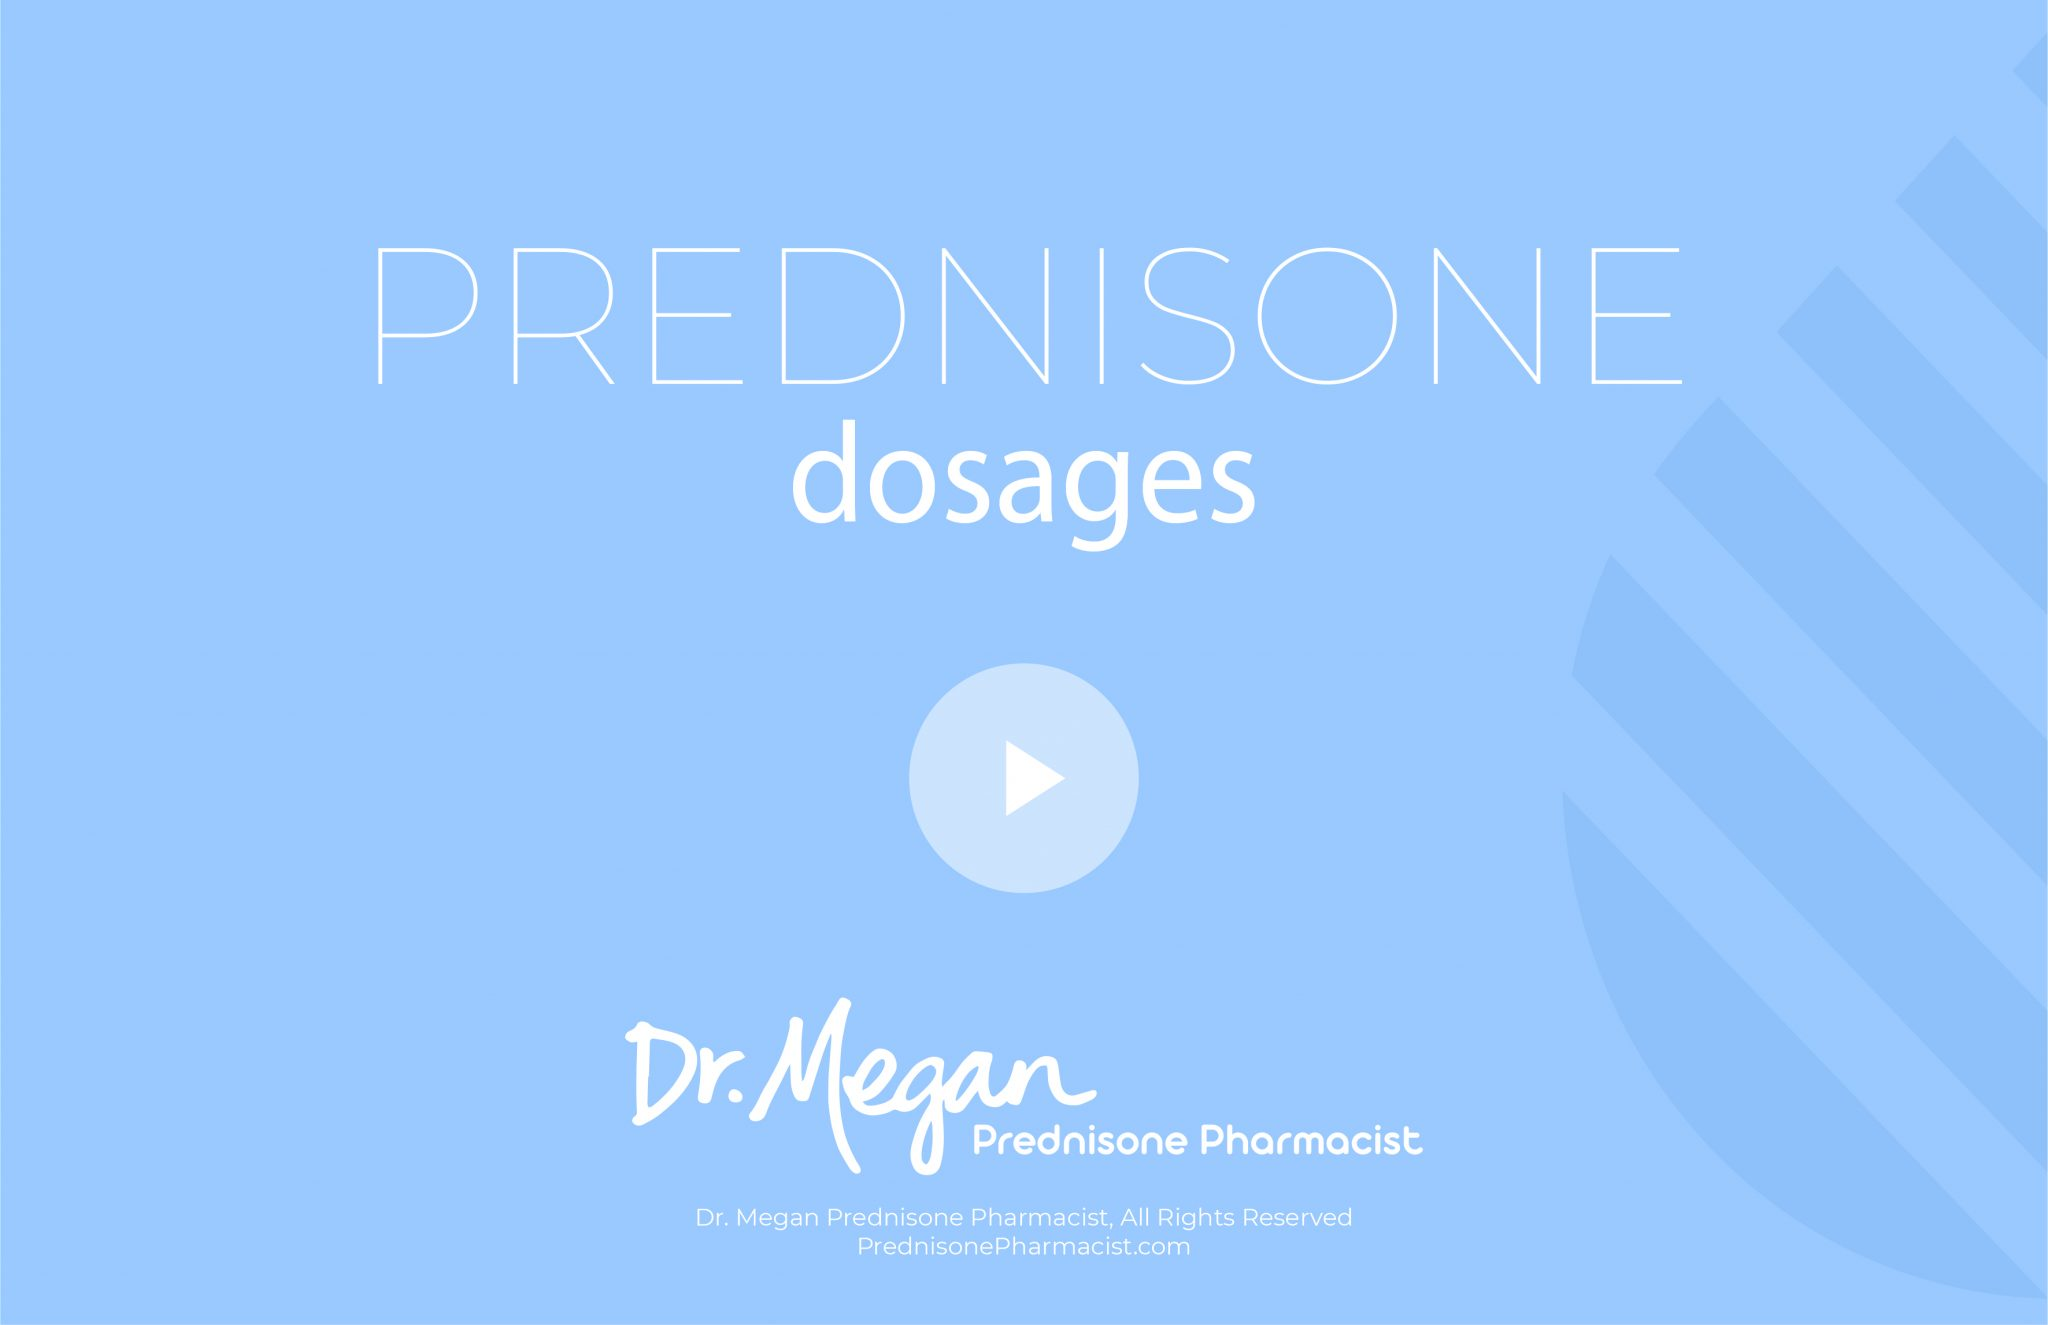 Prednisone Dose – Normal dosage for rheumatoid arthritis? Asthma?